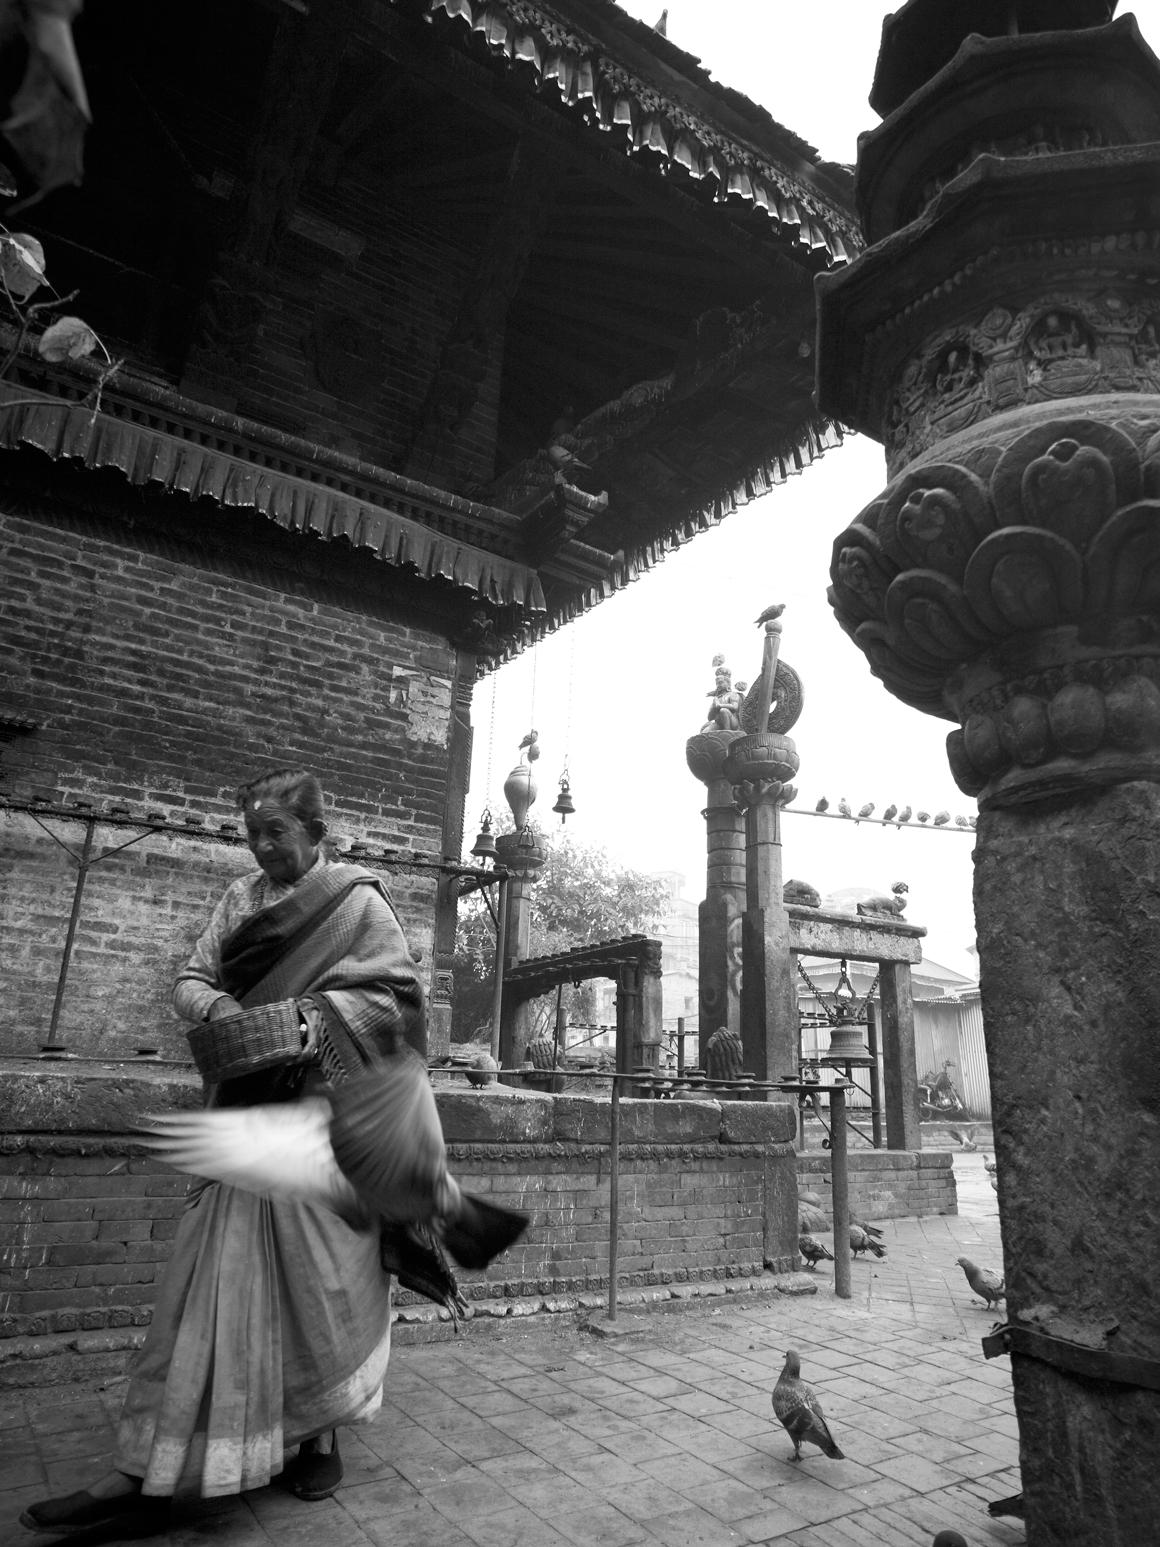 130206_CNT_Bhaktapur_Taumadhi_Sq_1635.jpg